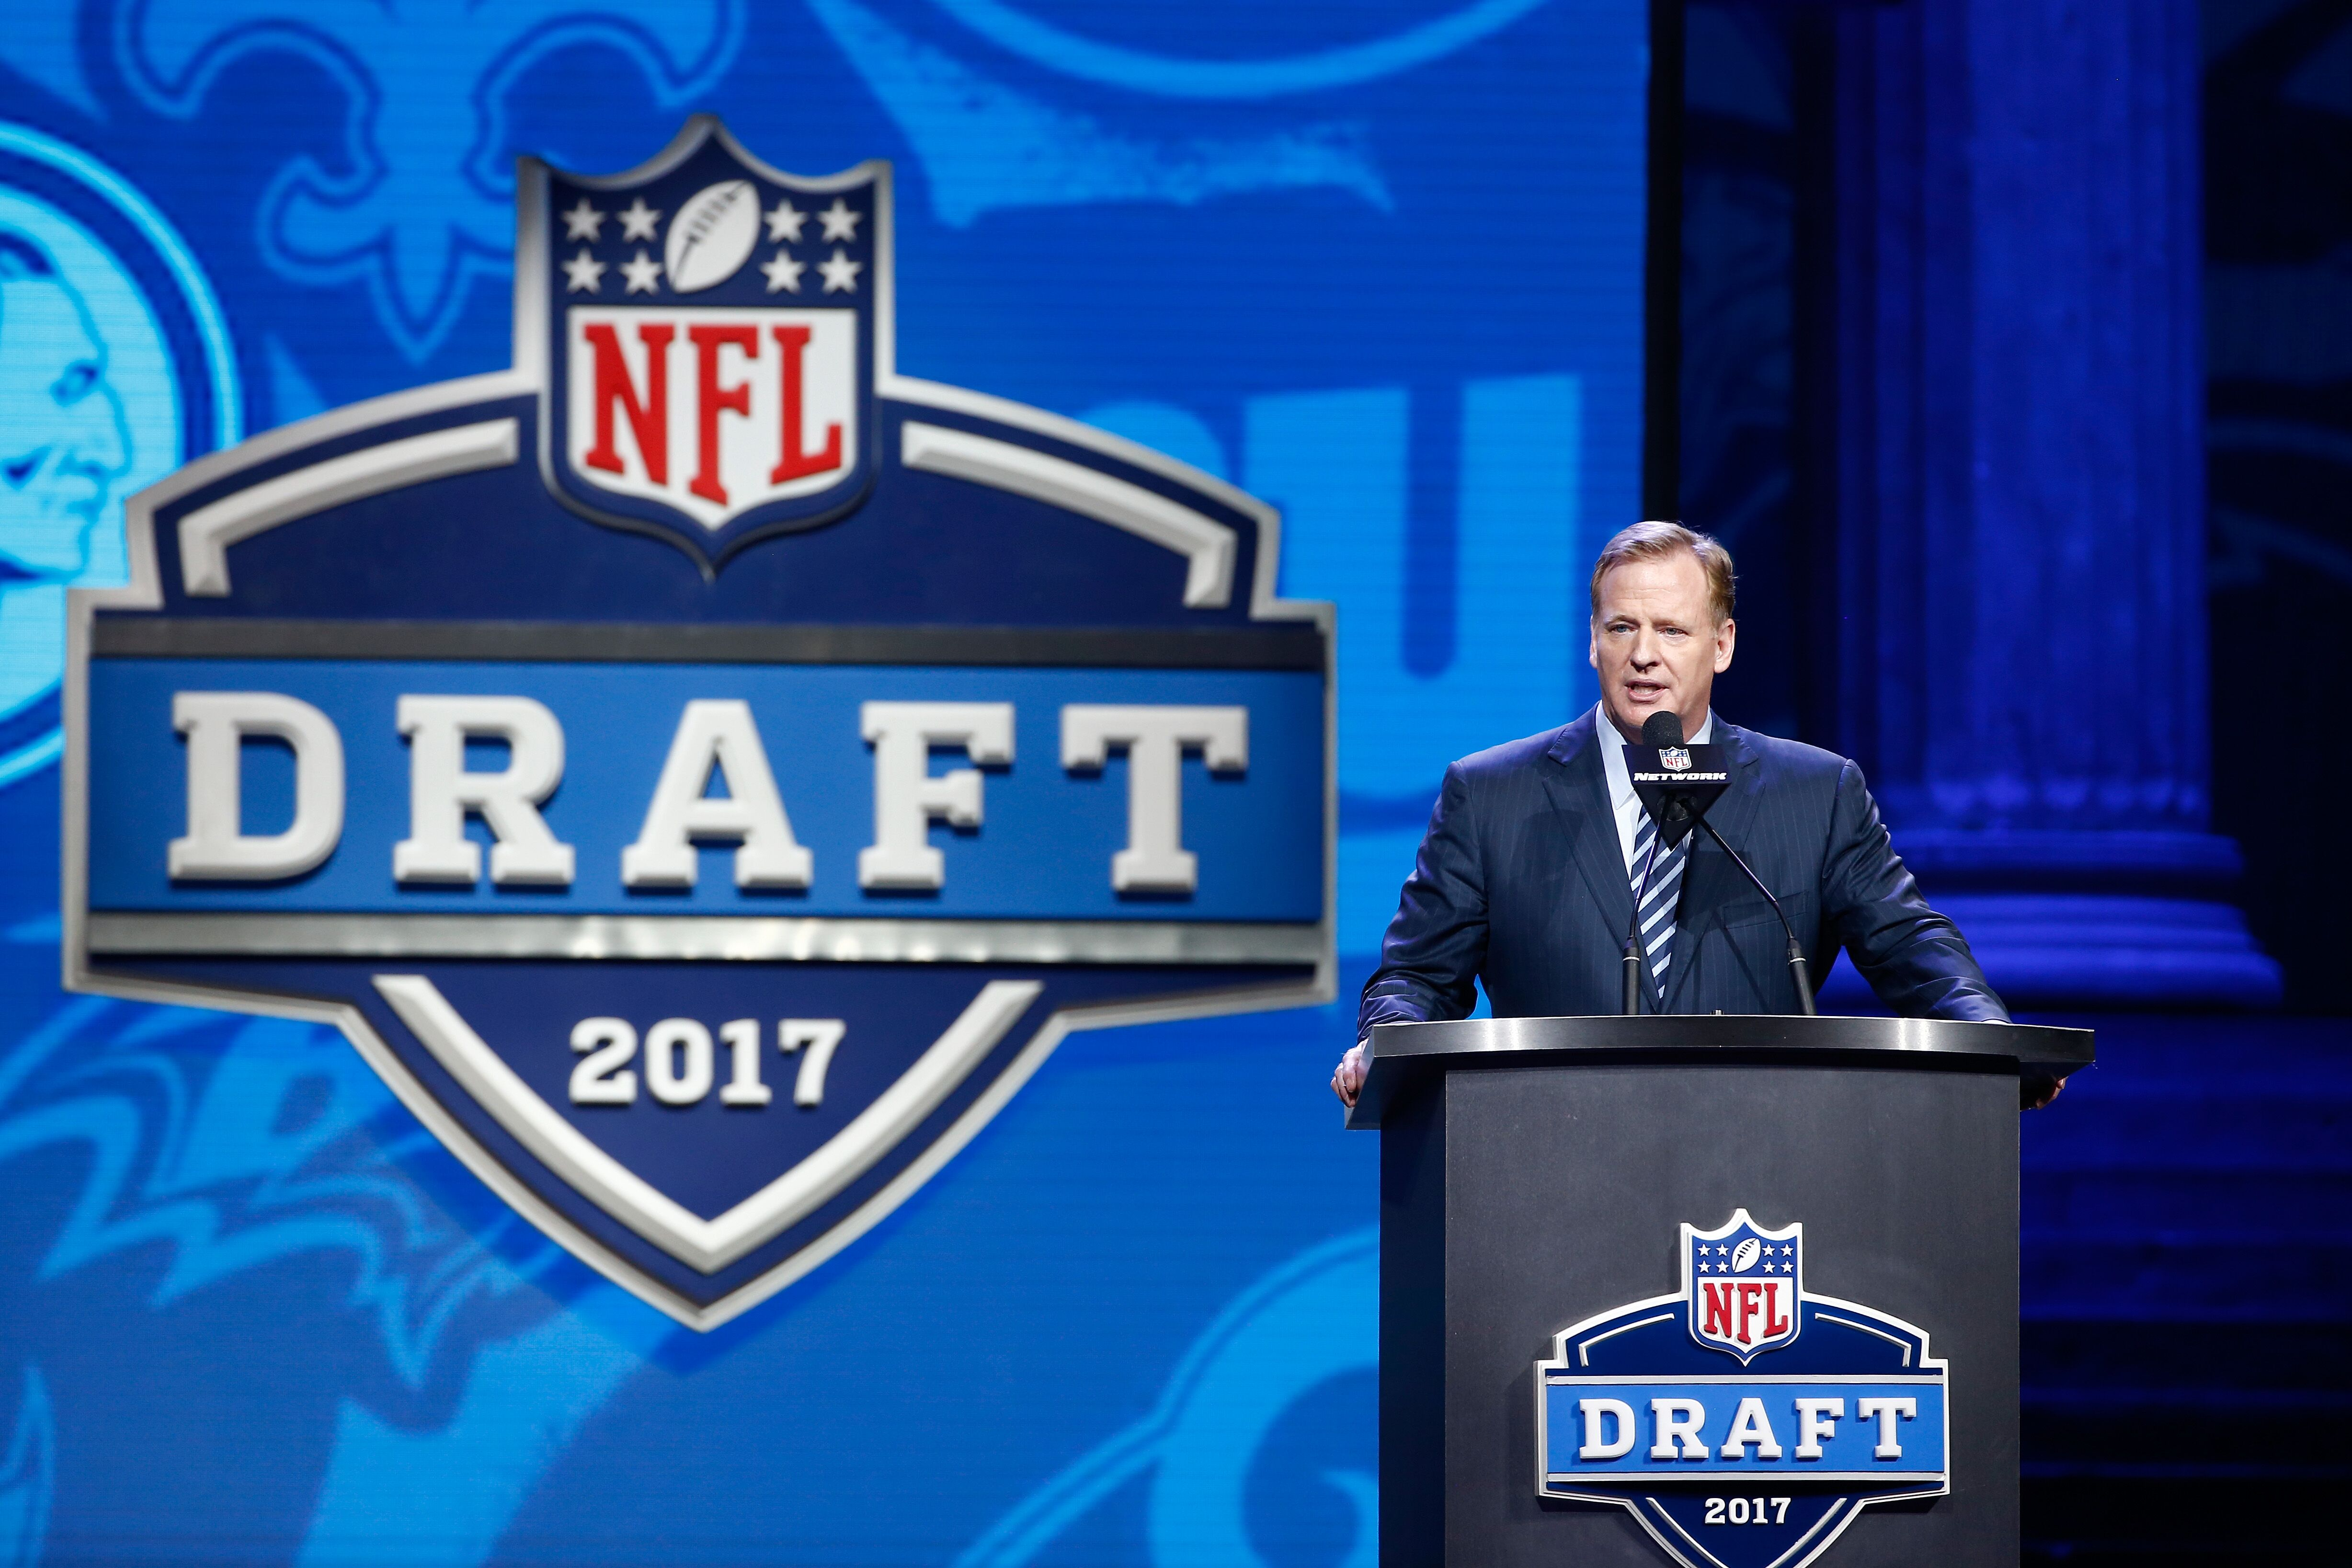 674185210-2017-nfl-draft.jpg